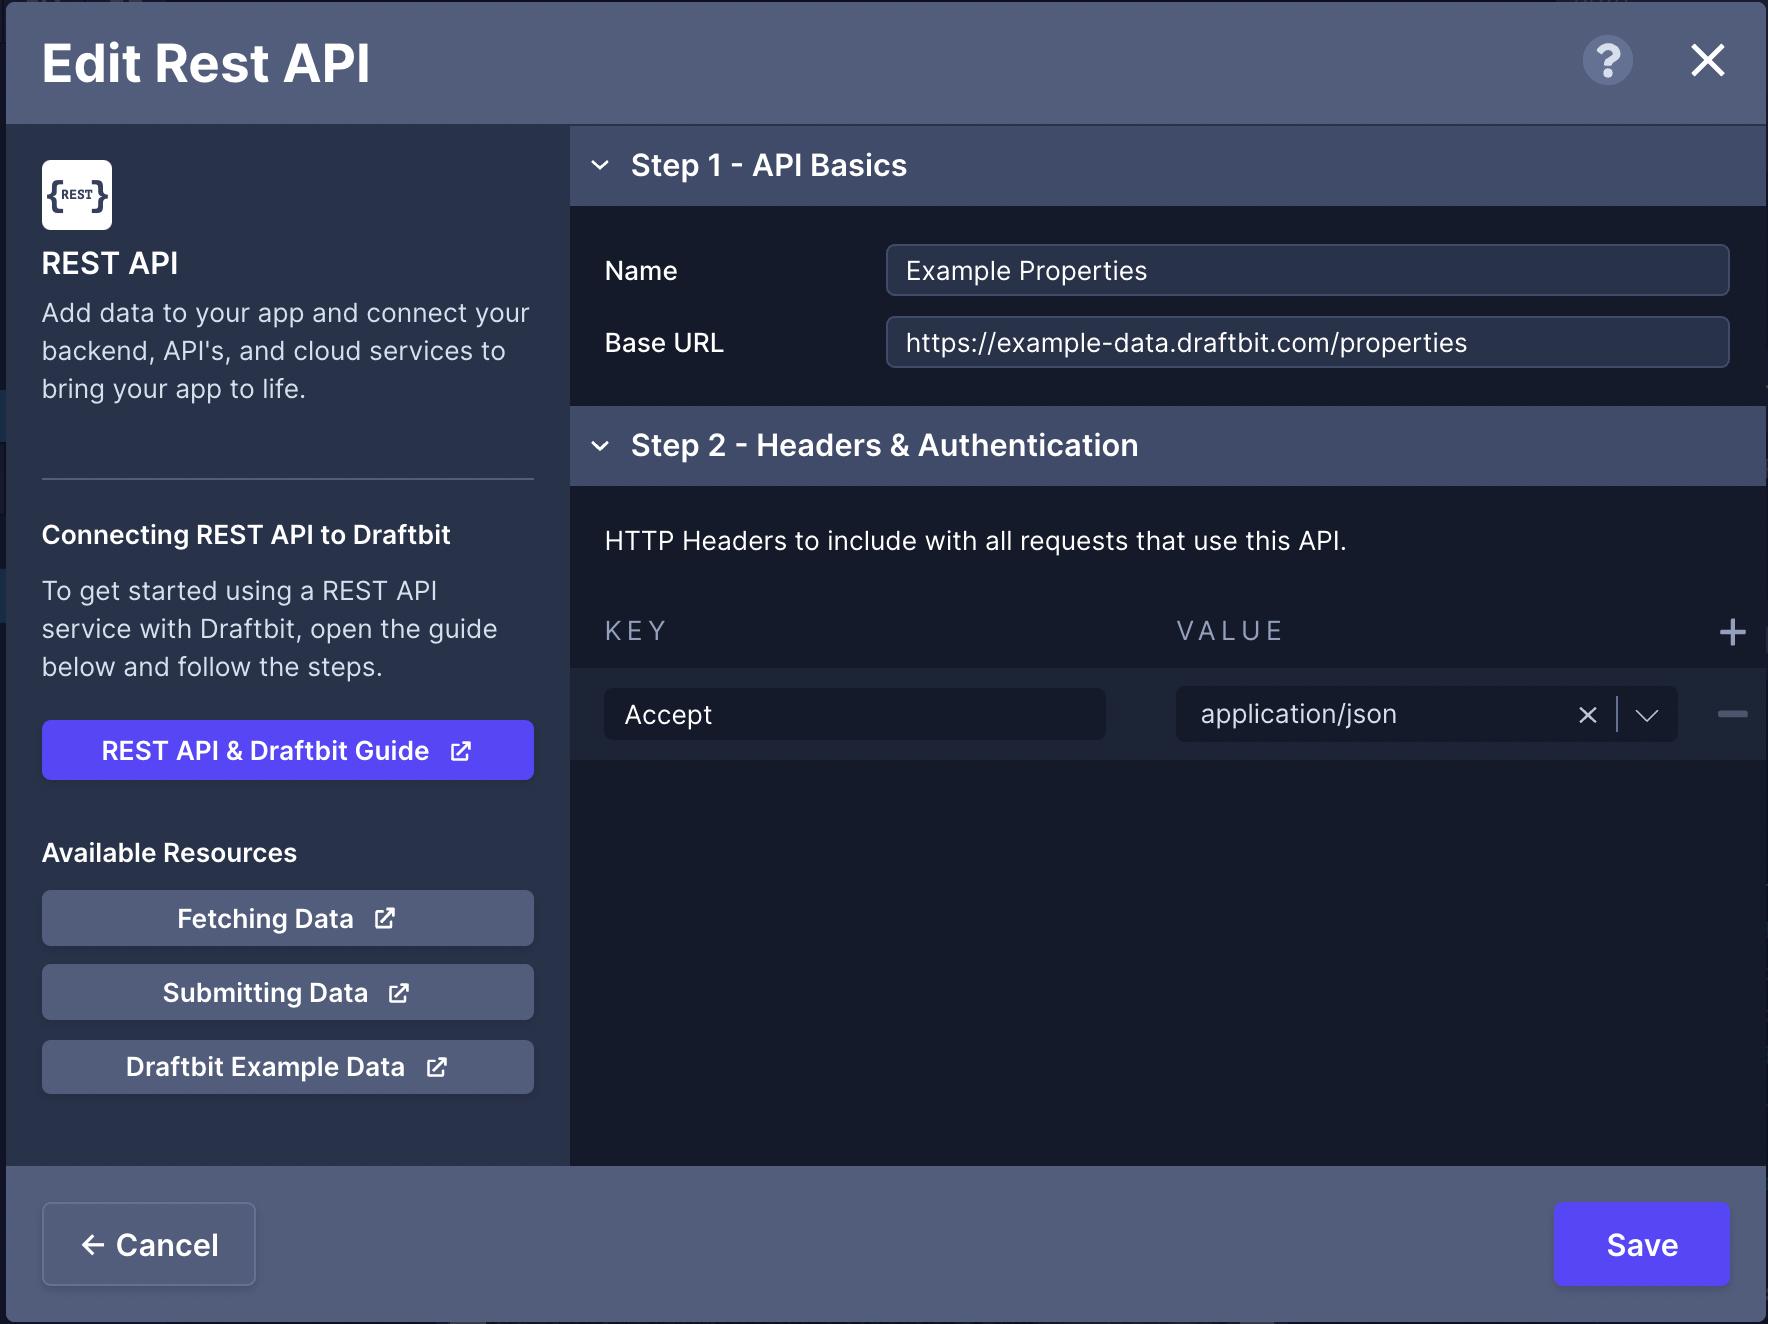 REST API Service